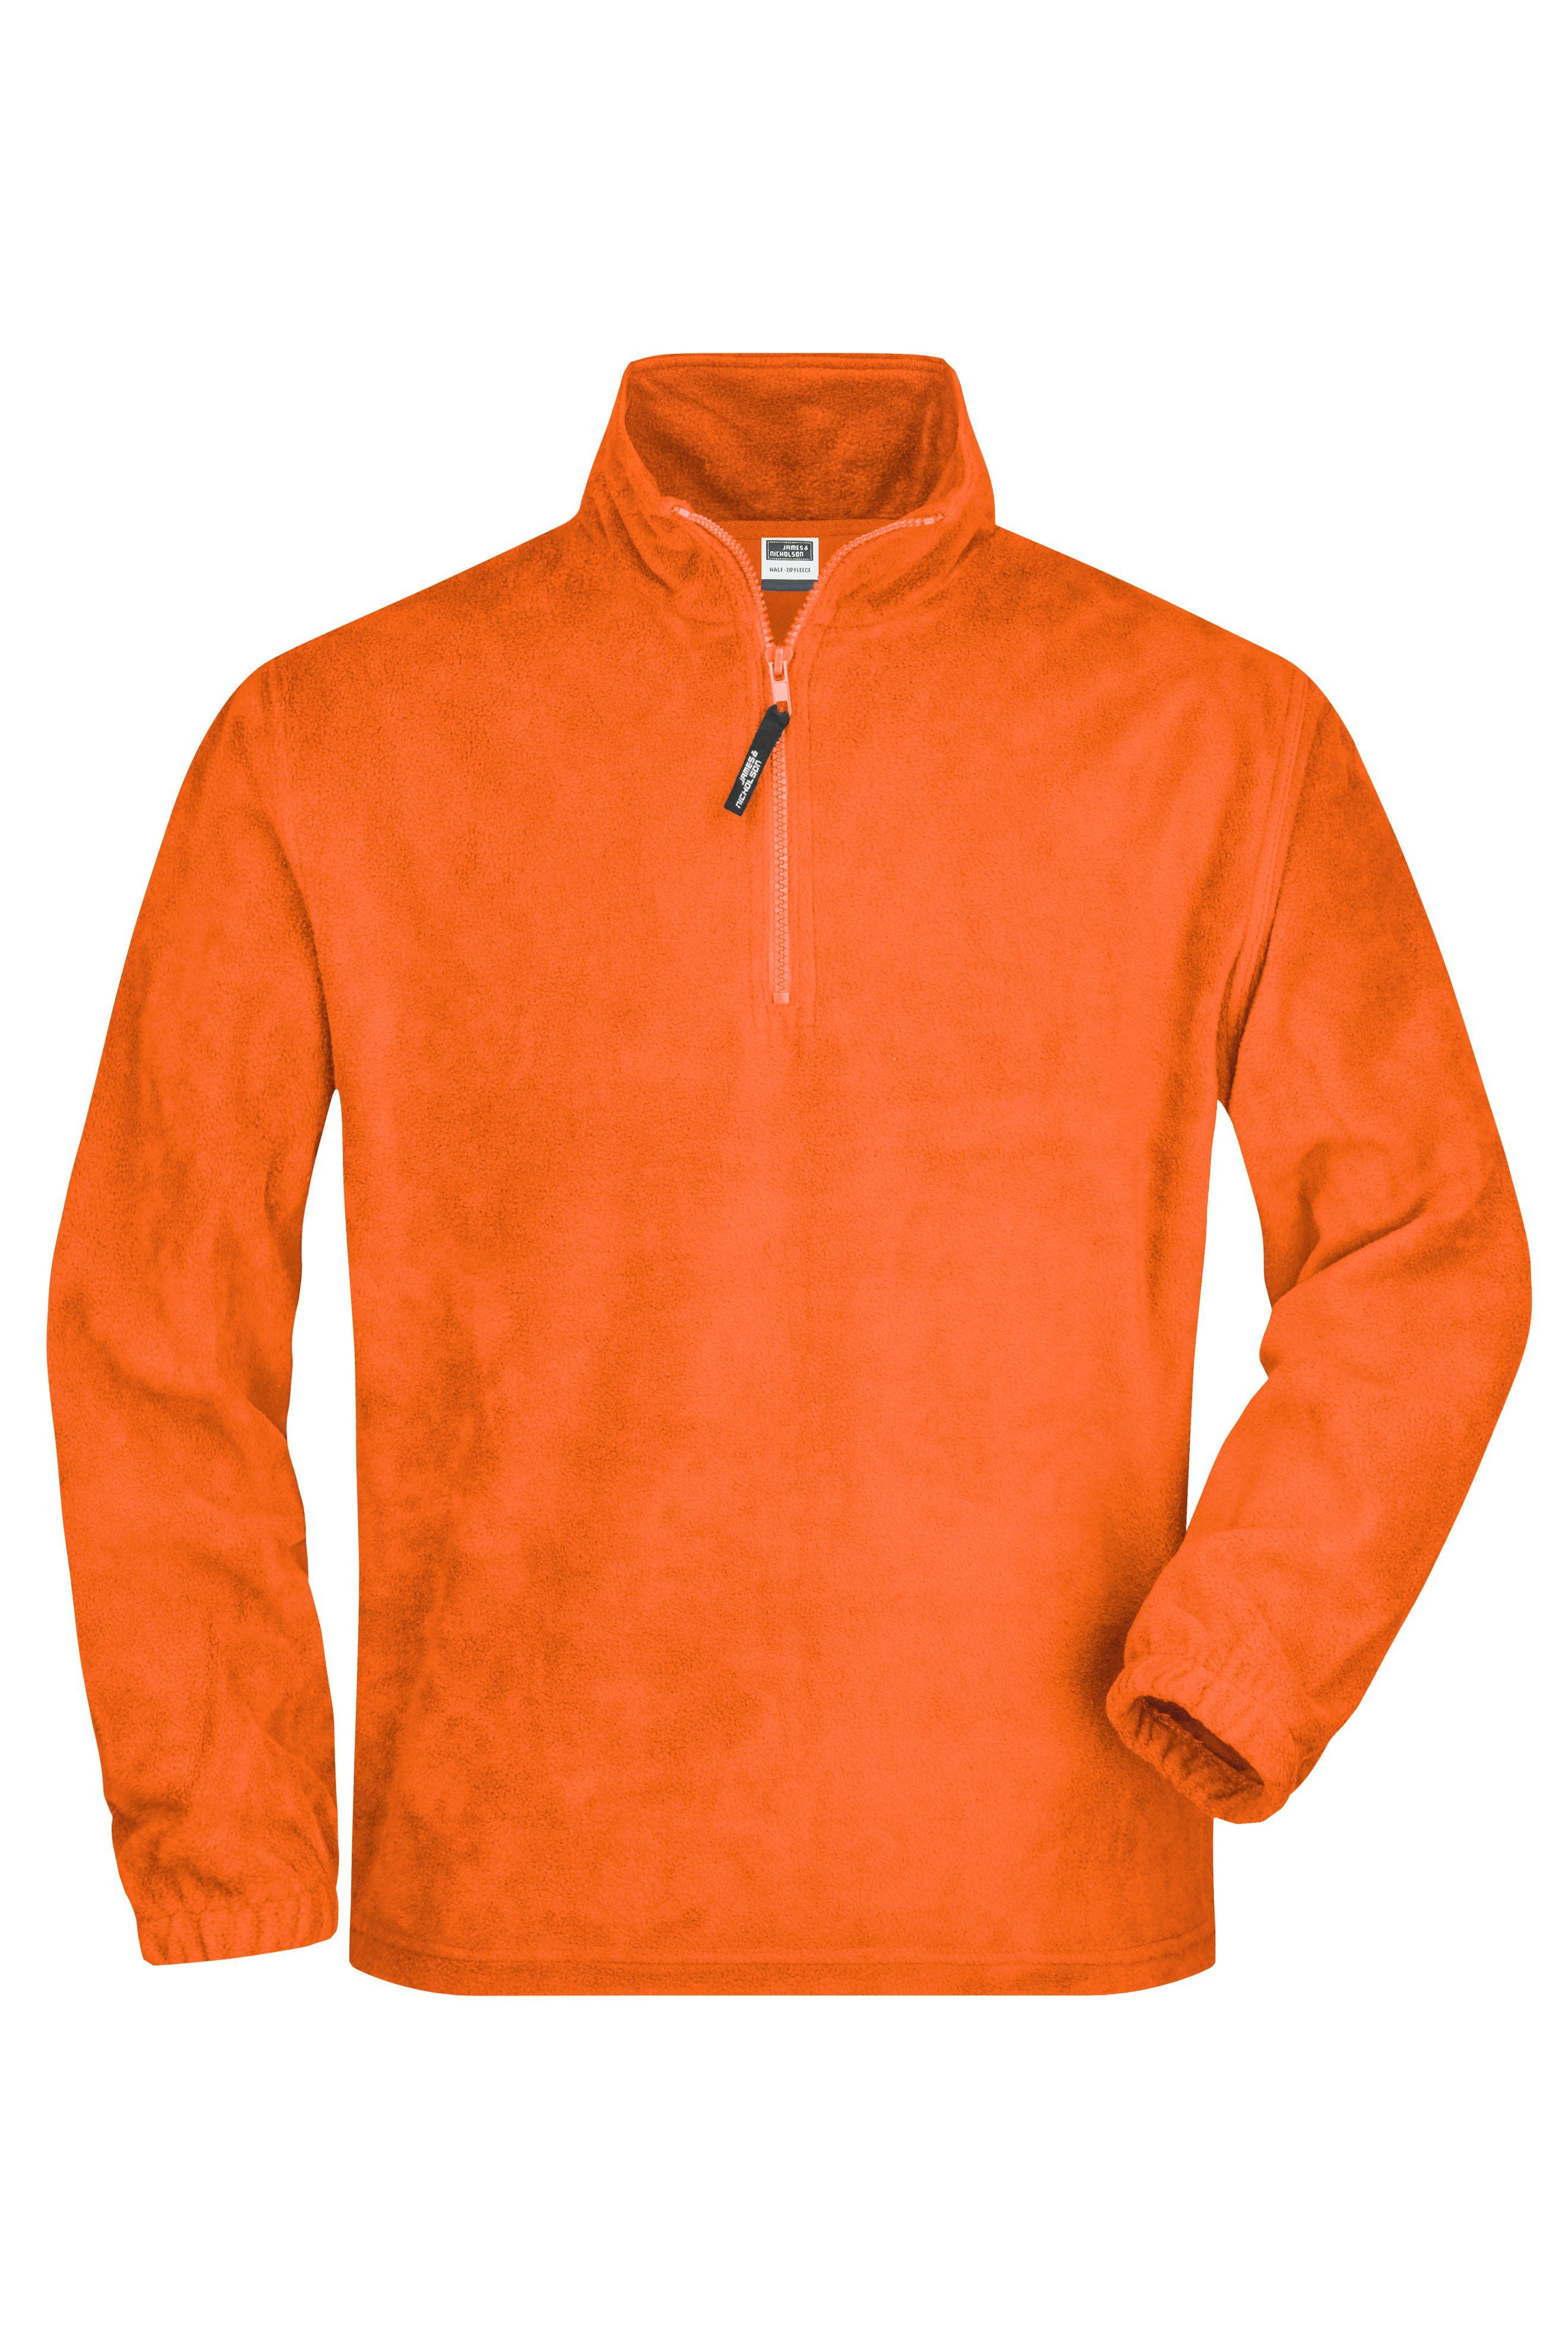 Sweatshirt in schwerer Fleece-Qualität